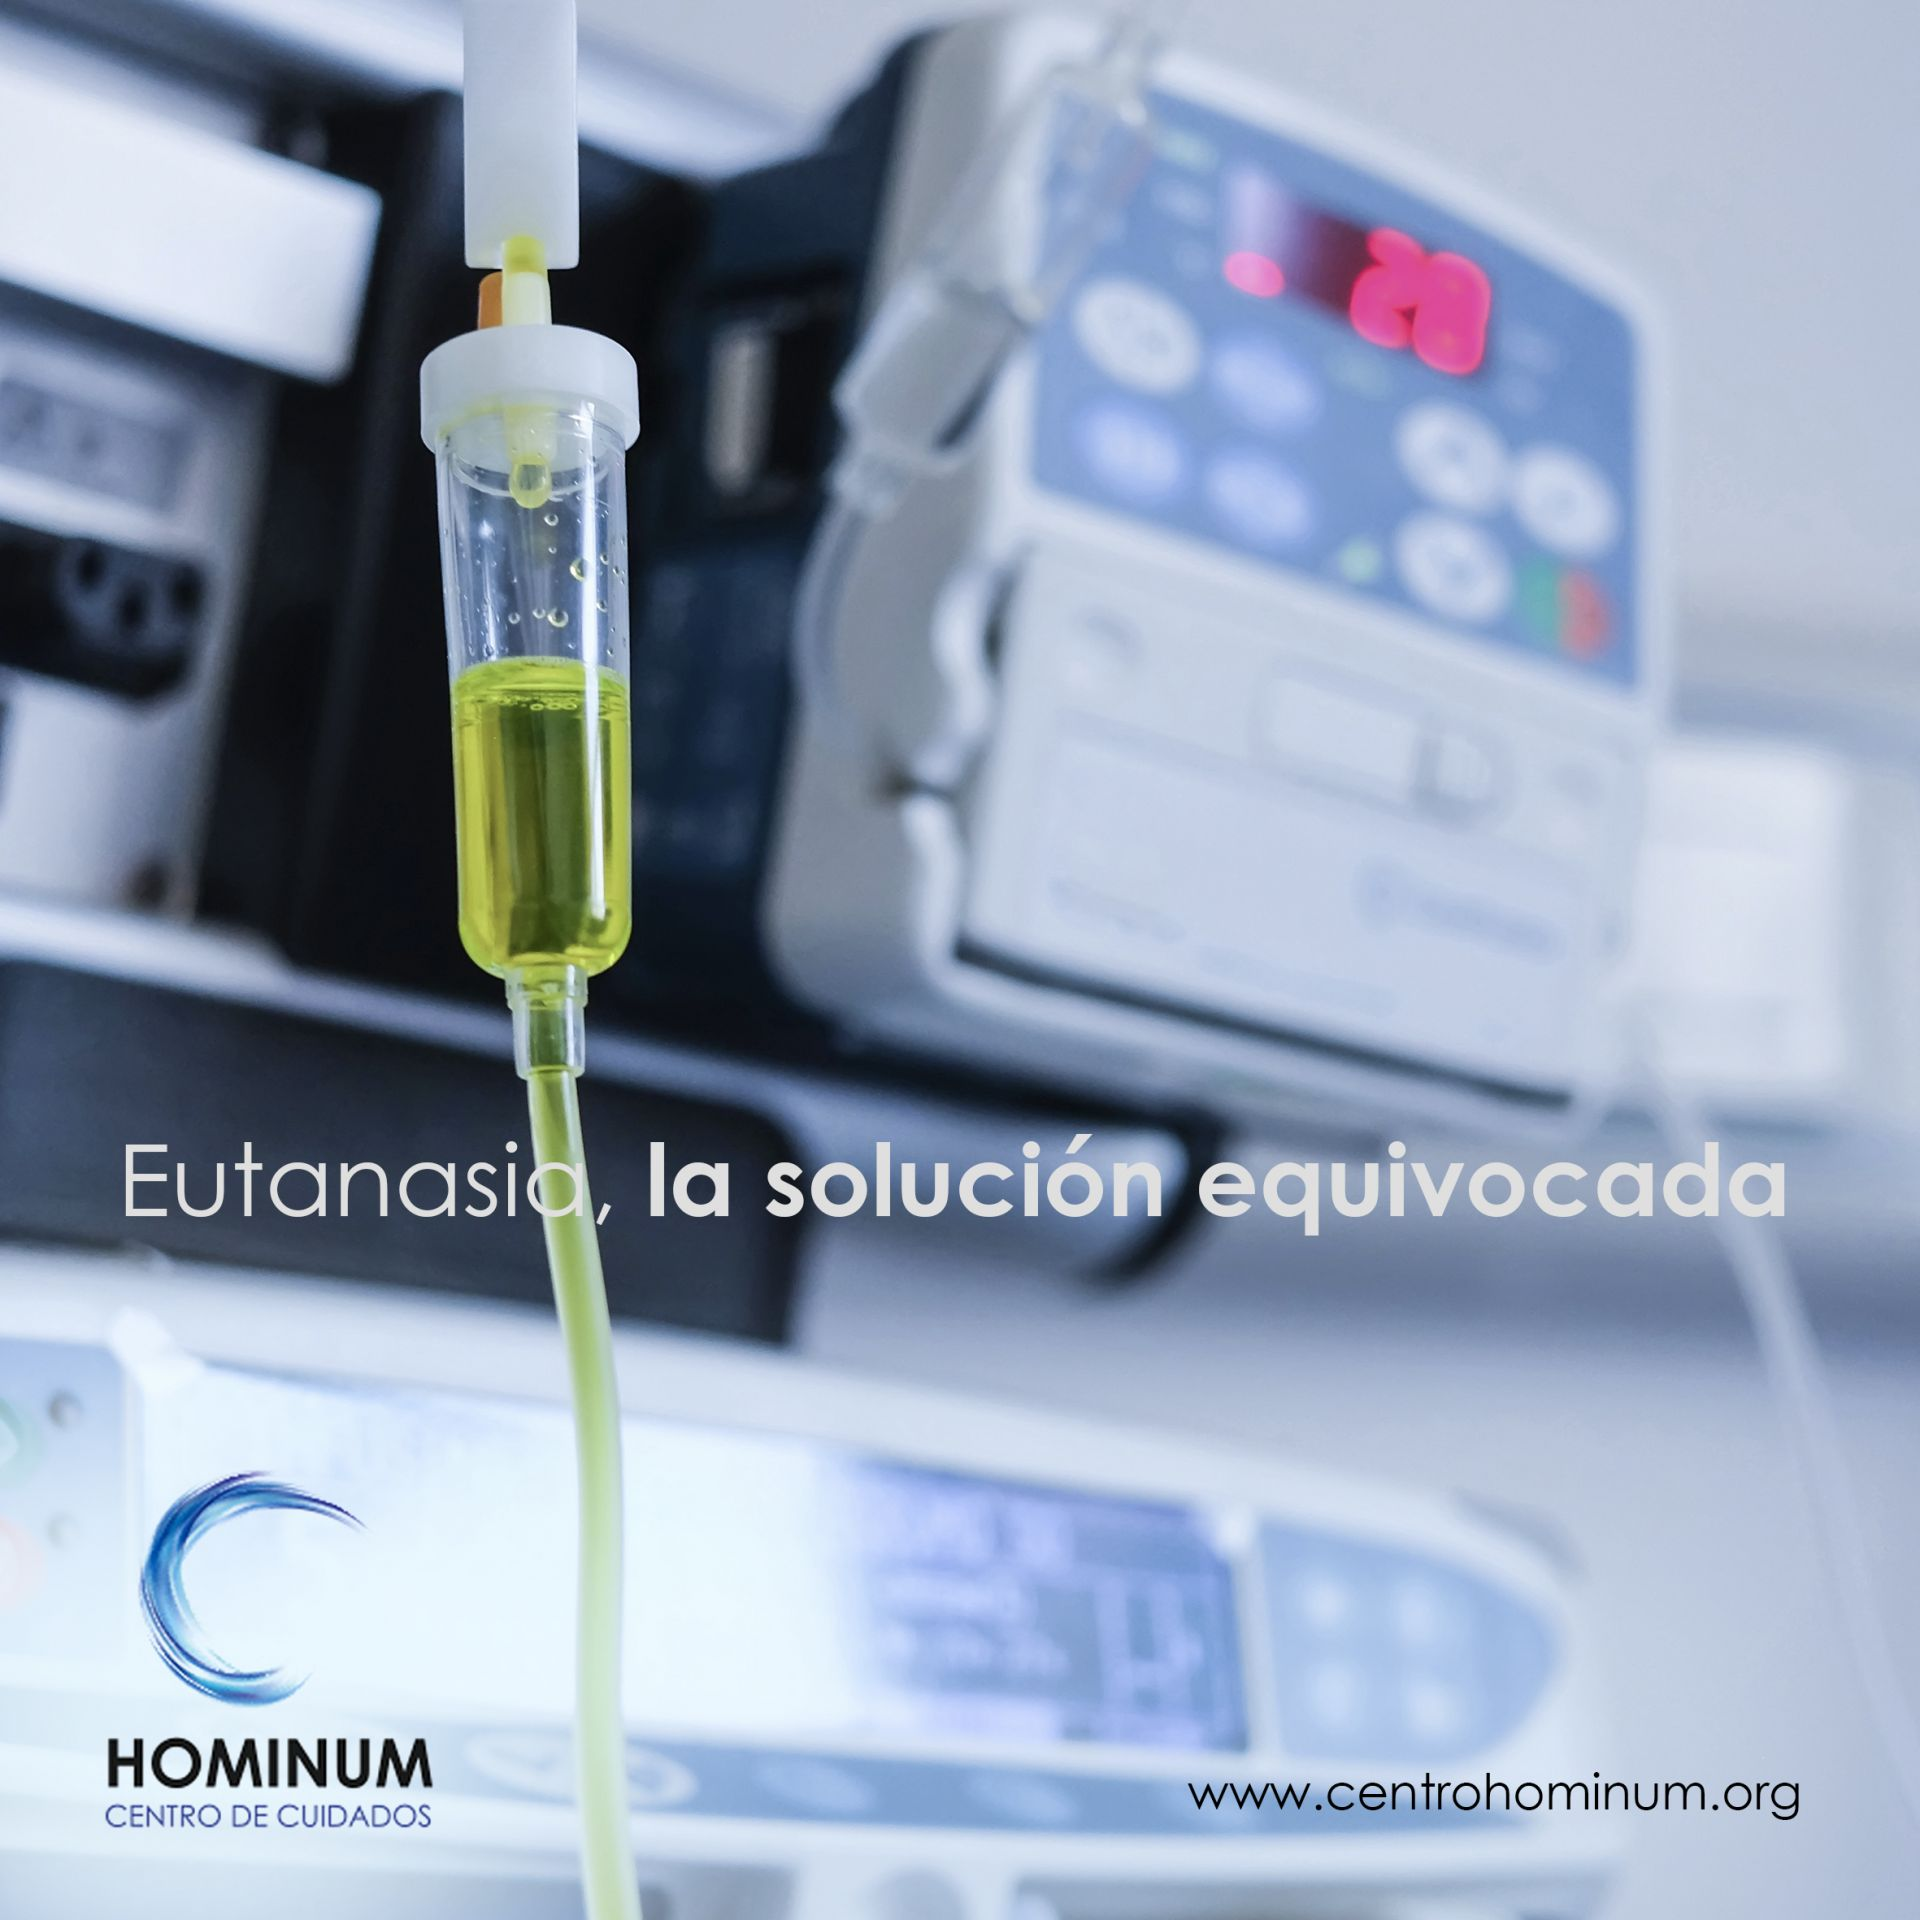 Eutanasia, la solución equivocada